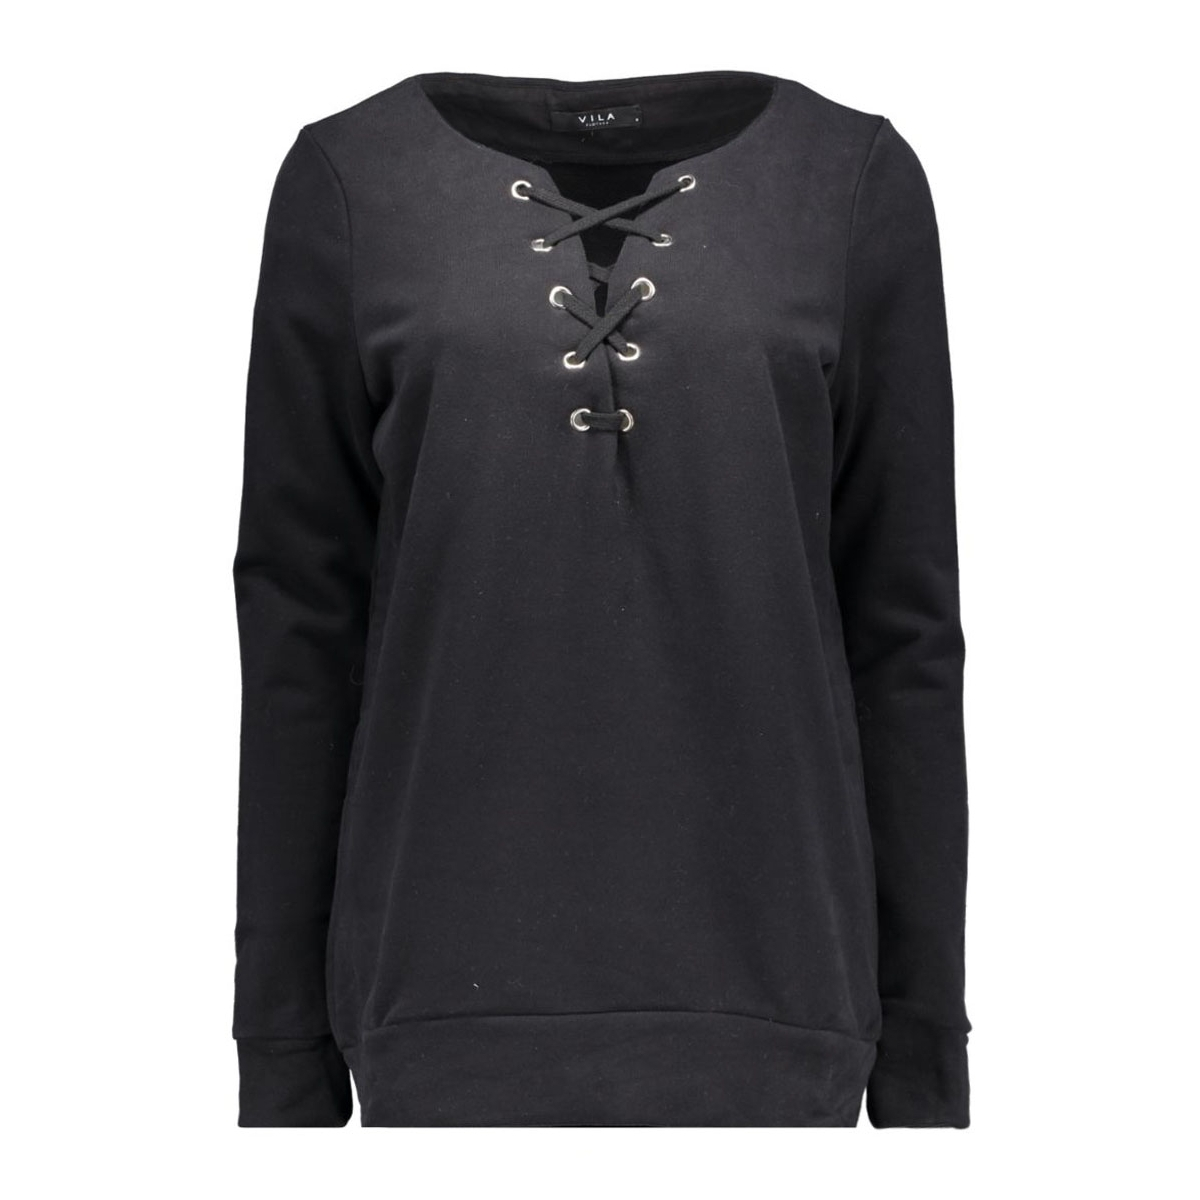 vistate sweat top/1 14038427 vila sweater black